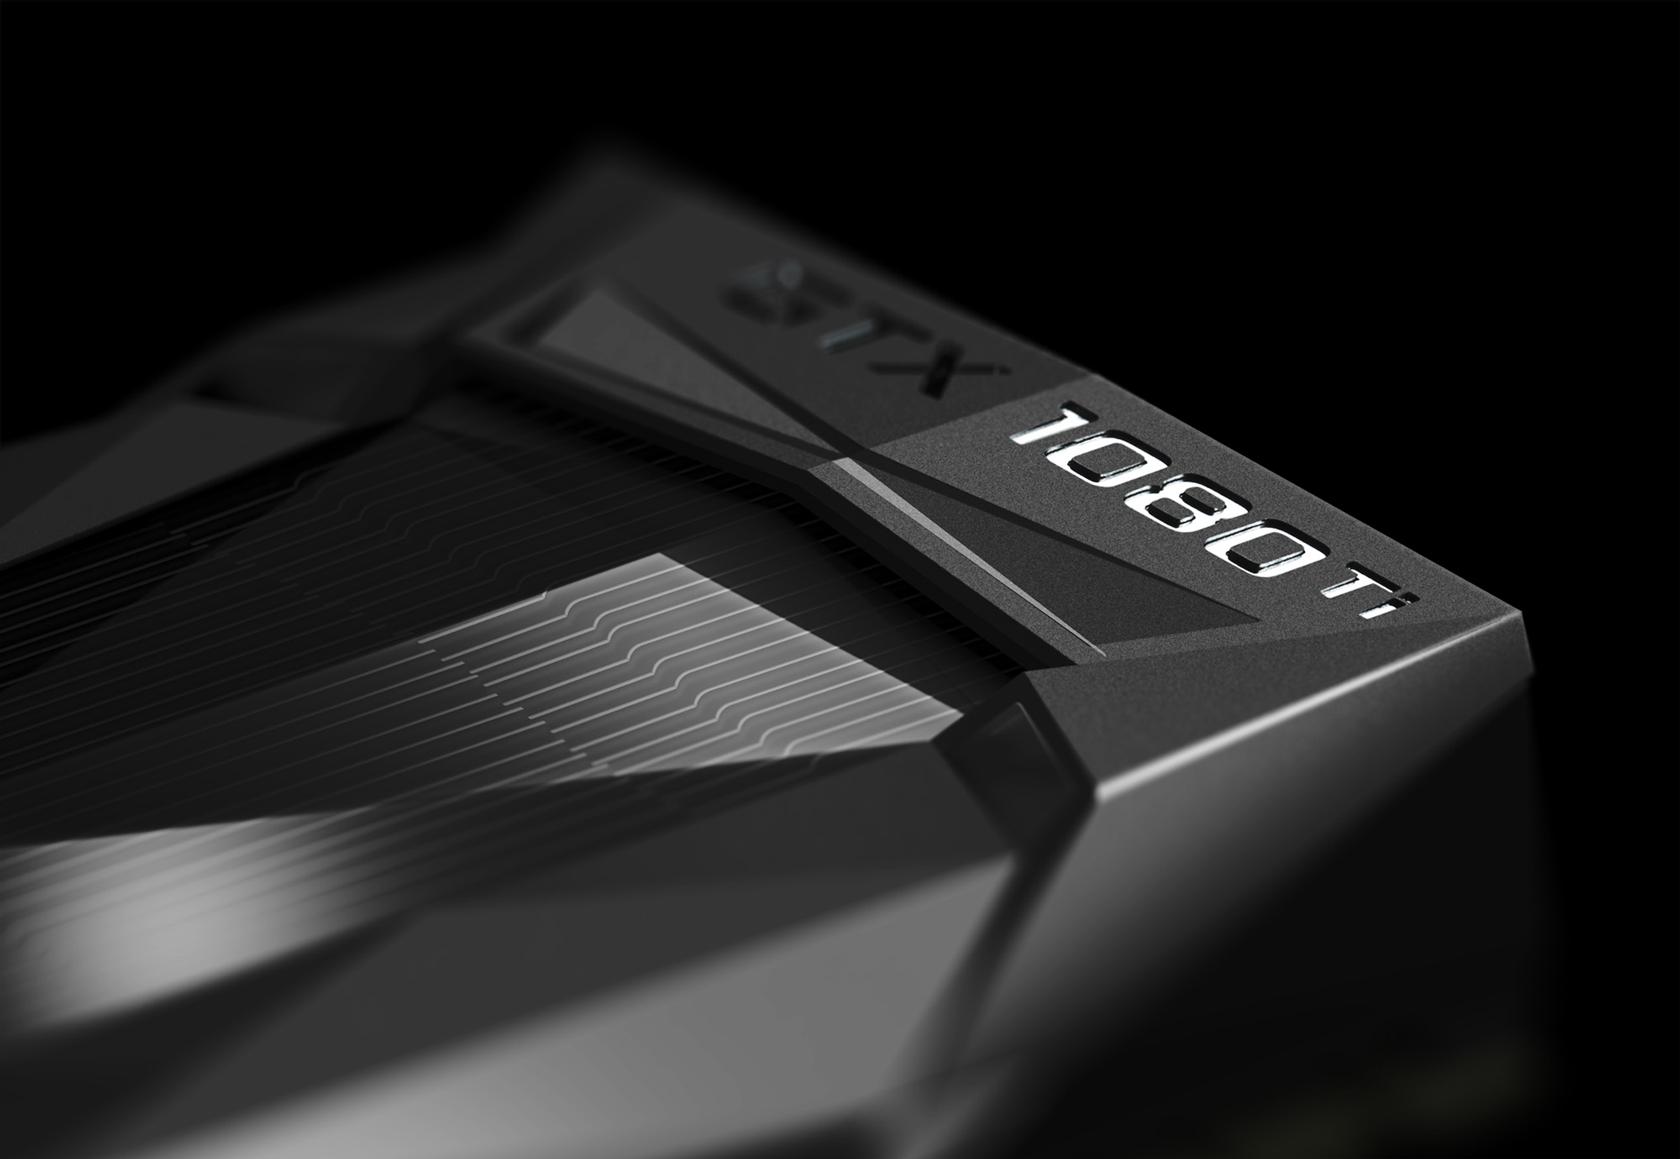 NVIDIA-GeForce-GTX-1080-Ti-Graphics-Card_3. Последняя информация о видеокарте NVIDIA GeForce GTX 1080 Ti